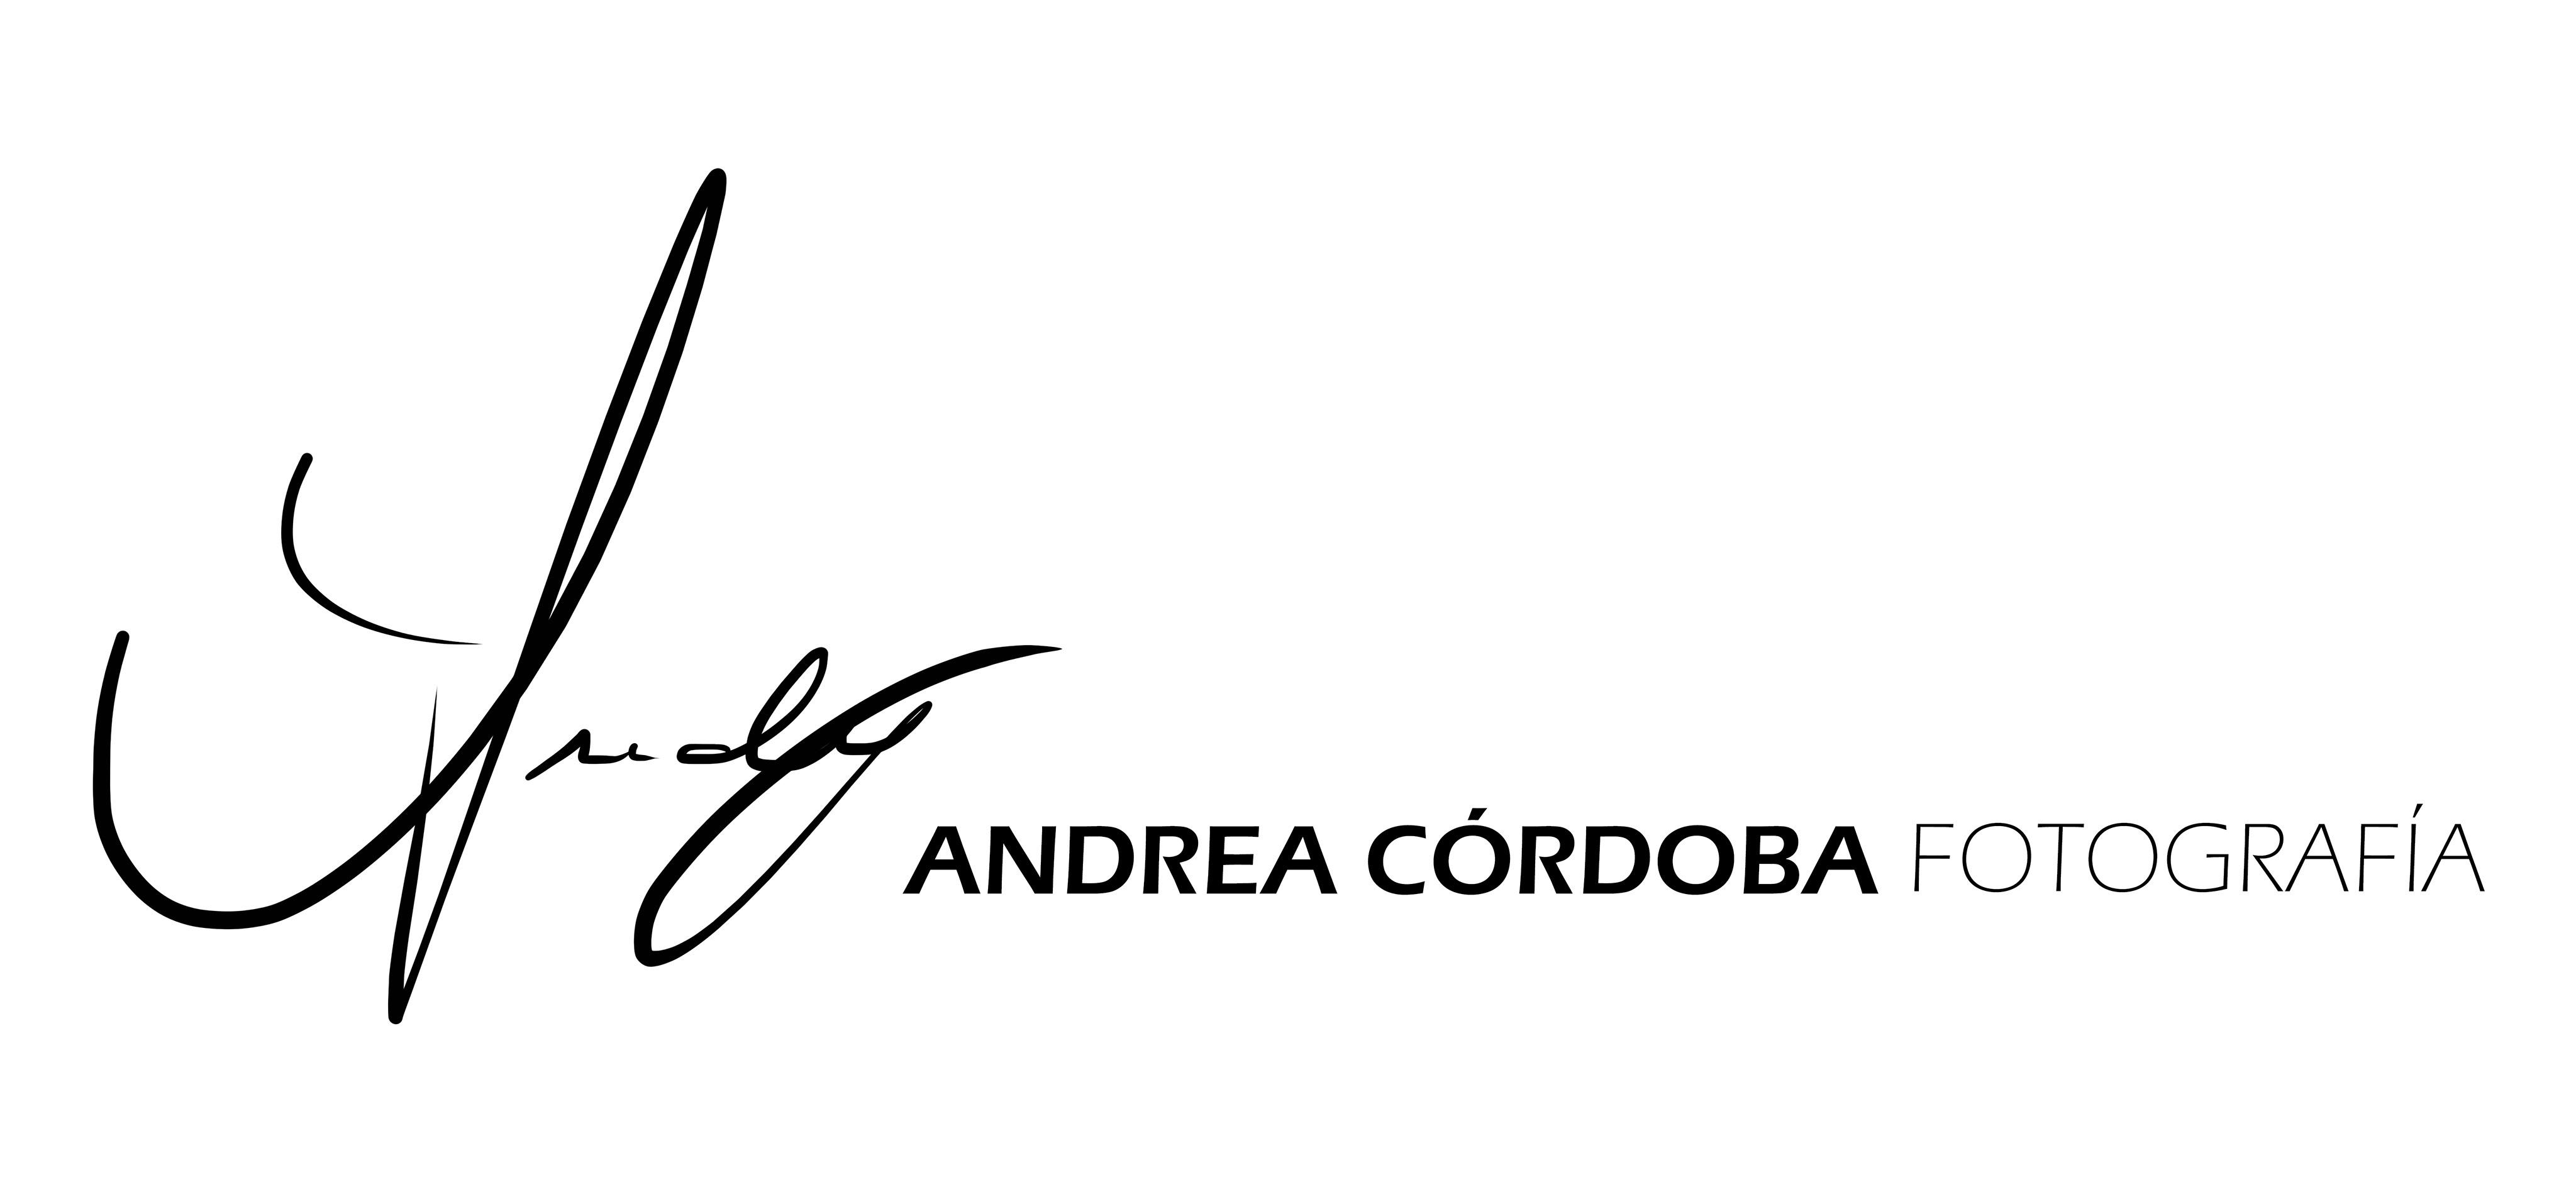 Andrea Córdoba